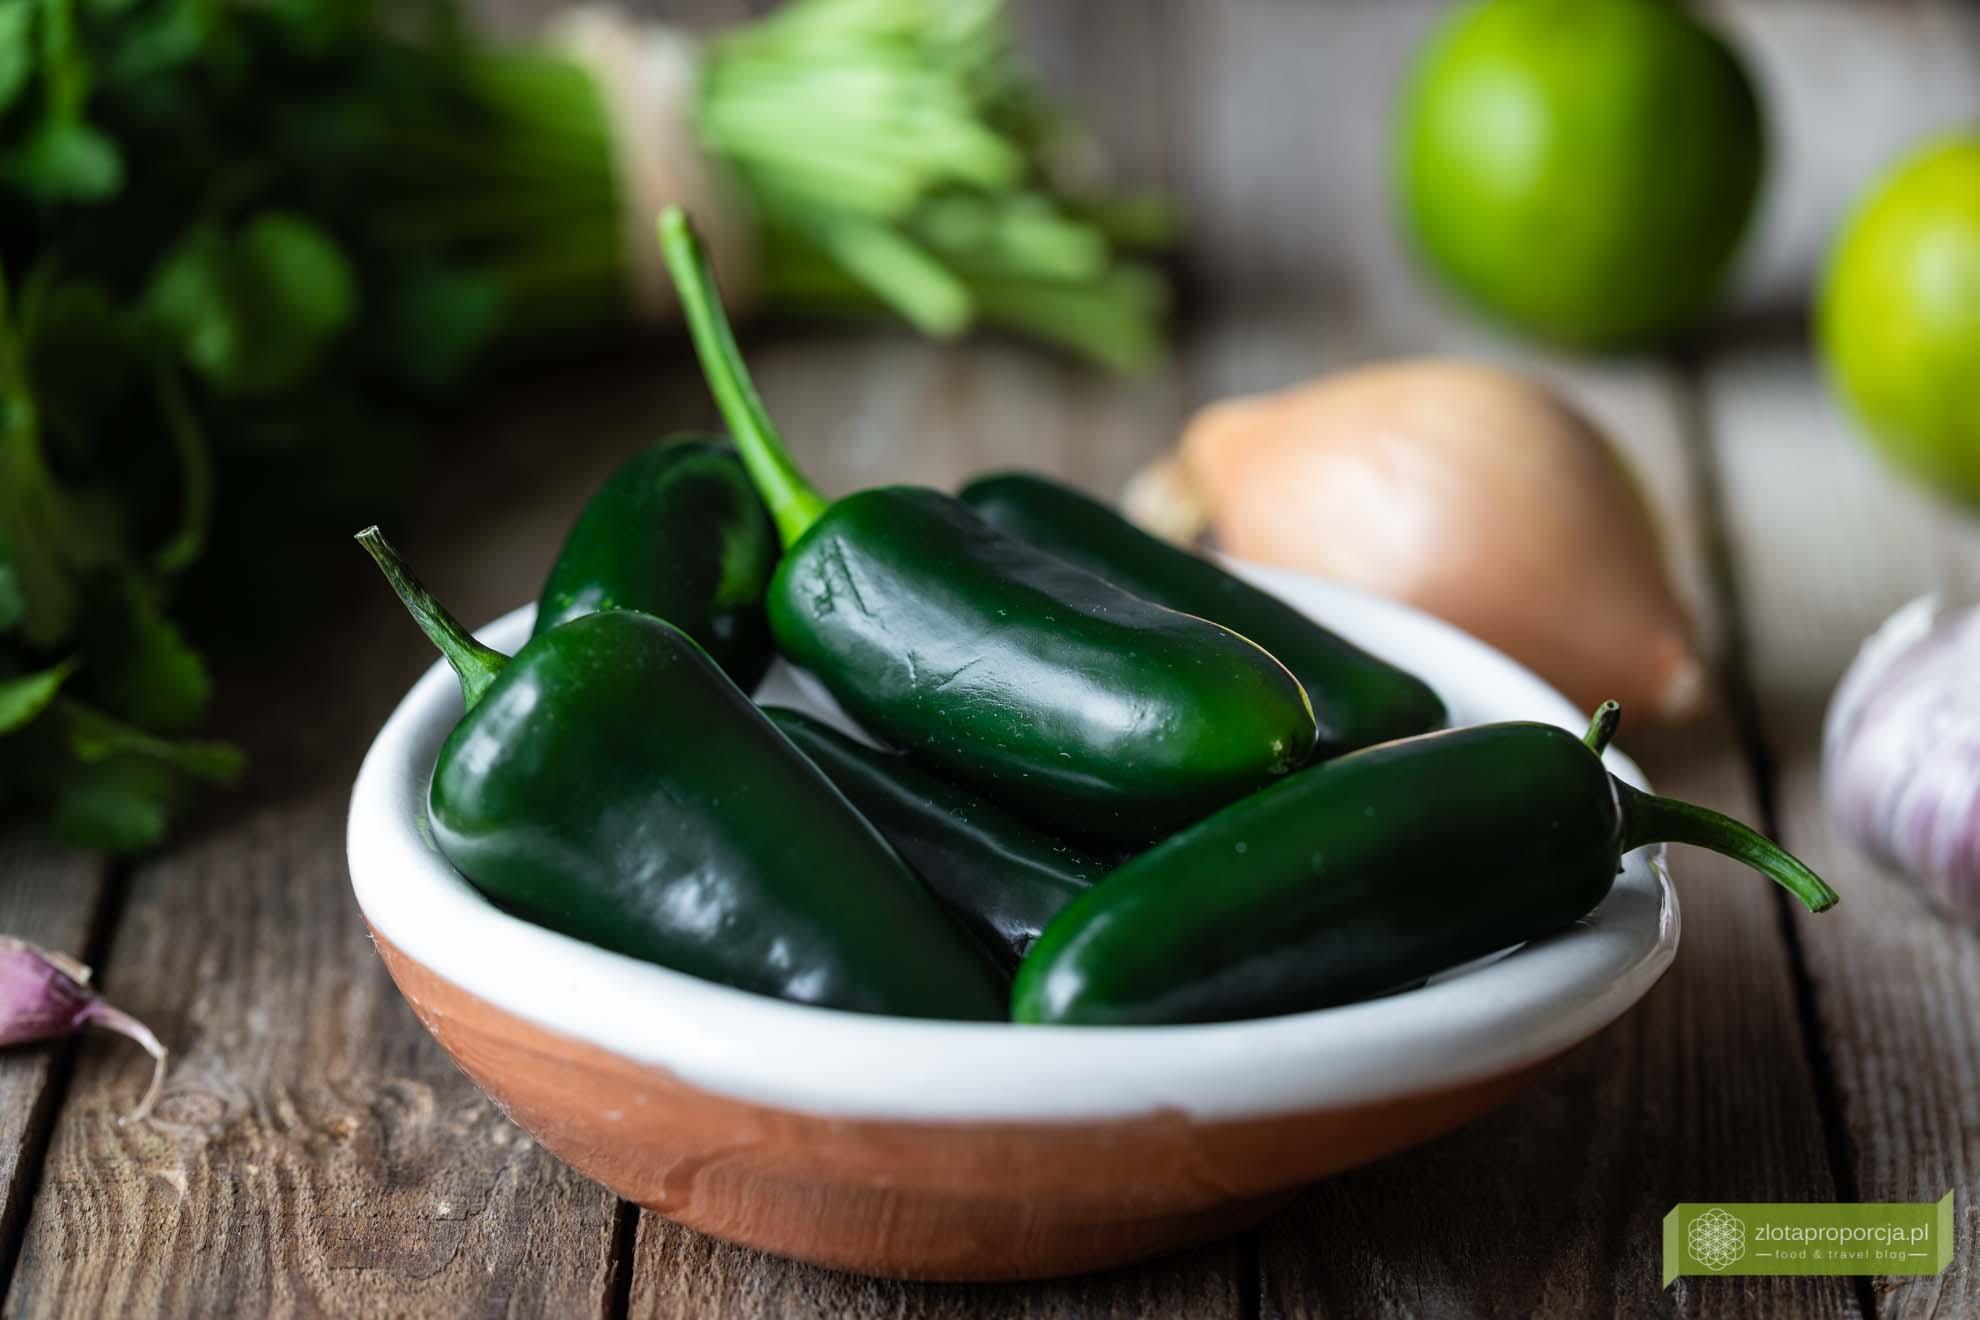 salsa jalapeno; salsa z papryczek jalapeno; ostra salsa meksykańska; salsa do nachosów; ostra salsa do nachosów; kuchnia meksykańska; salsa meksykańska; salsa z jalapeno; salsa z ostrych papryczek;